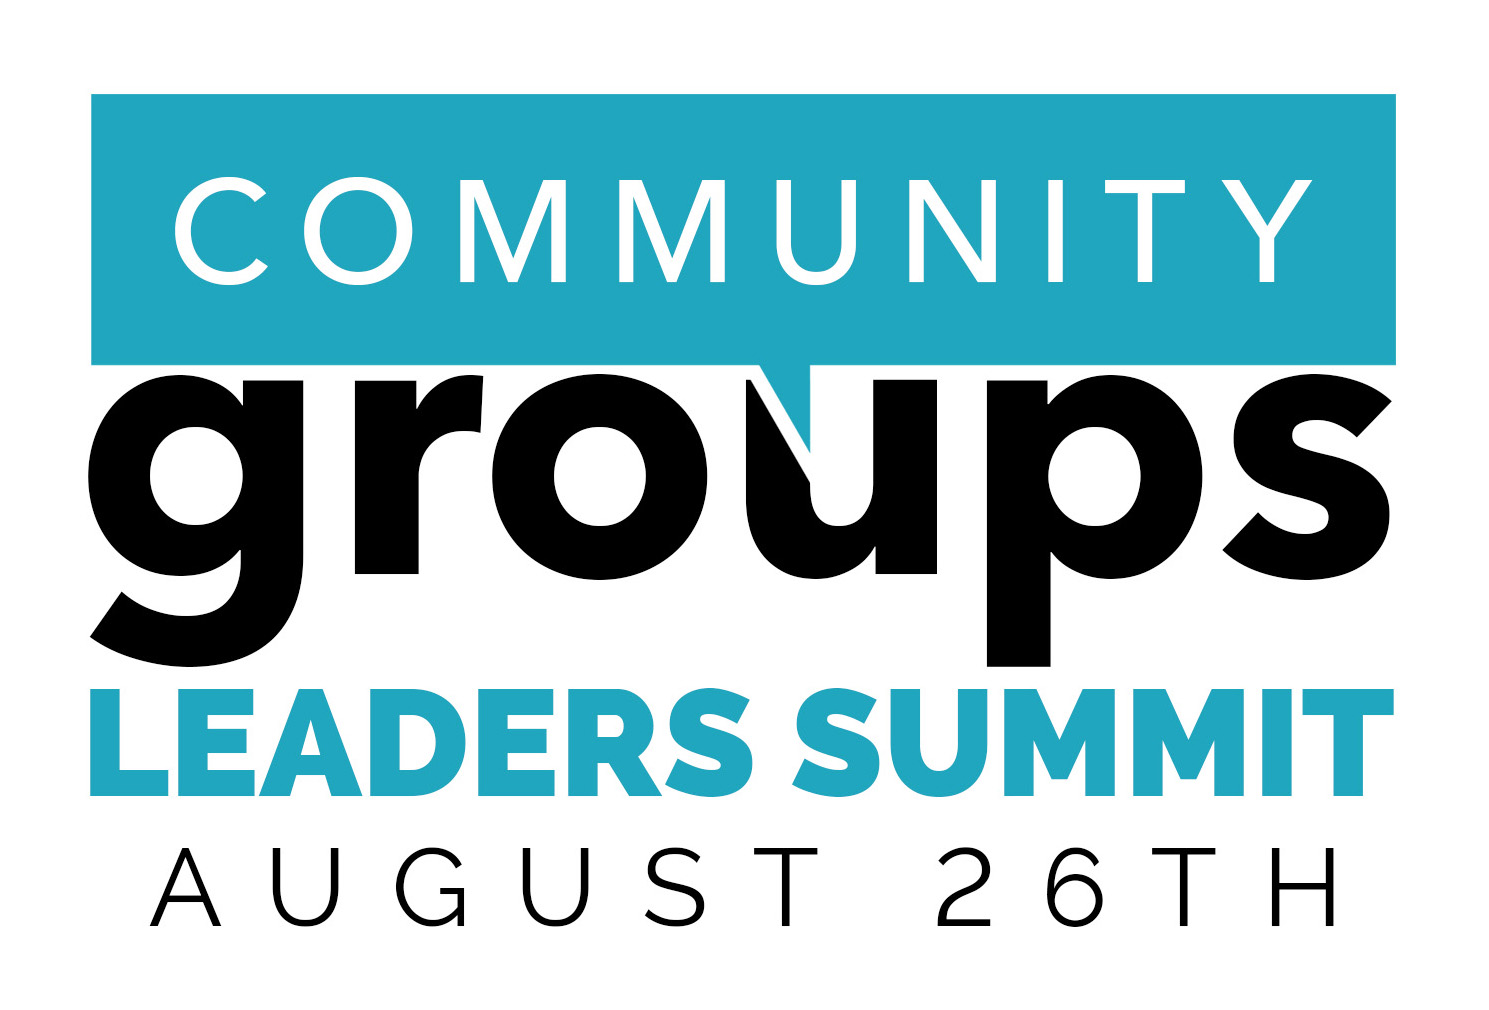 Communitygroupsummitlogo